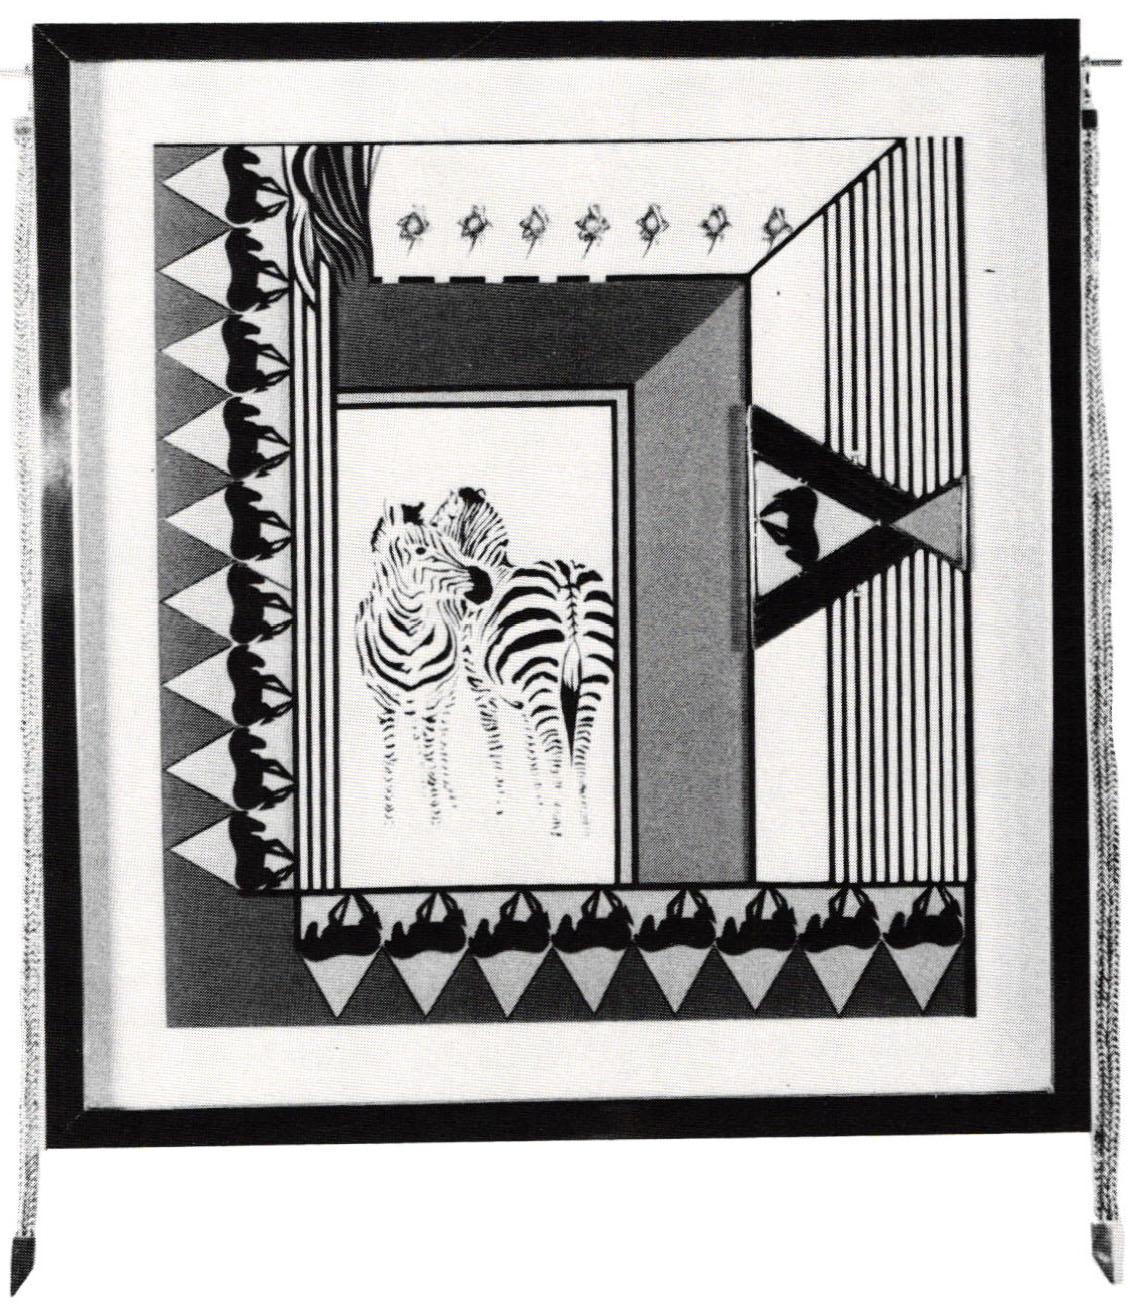 The Zebras Rose - Natalie Paul Exhibition